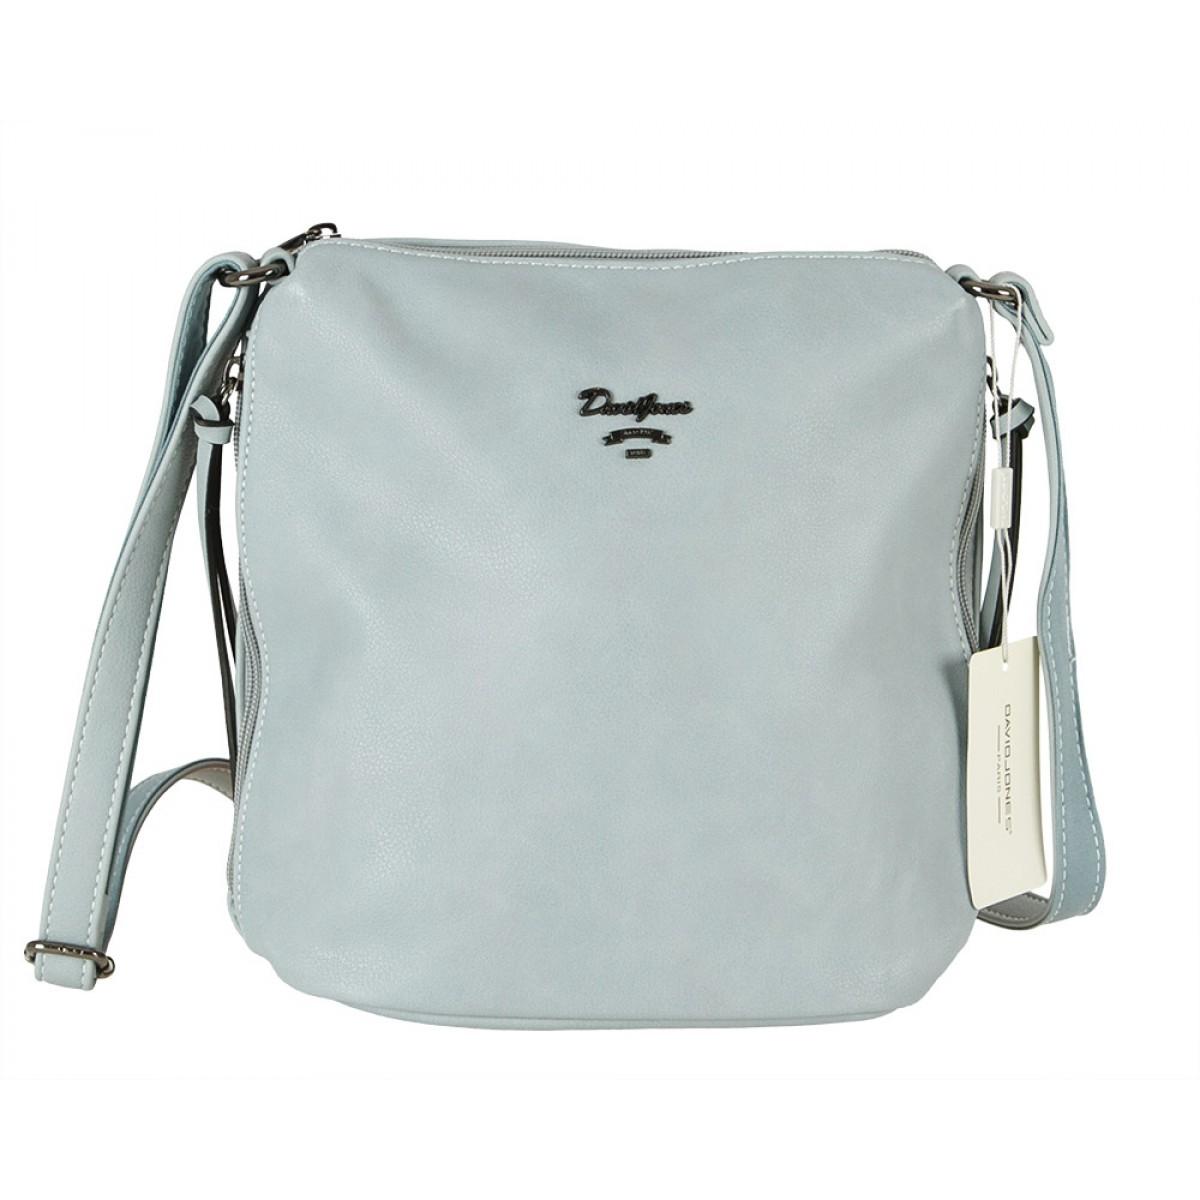 Жіноча сумка David Jones 6202-1A L.BLUE